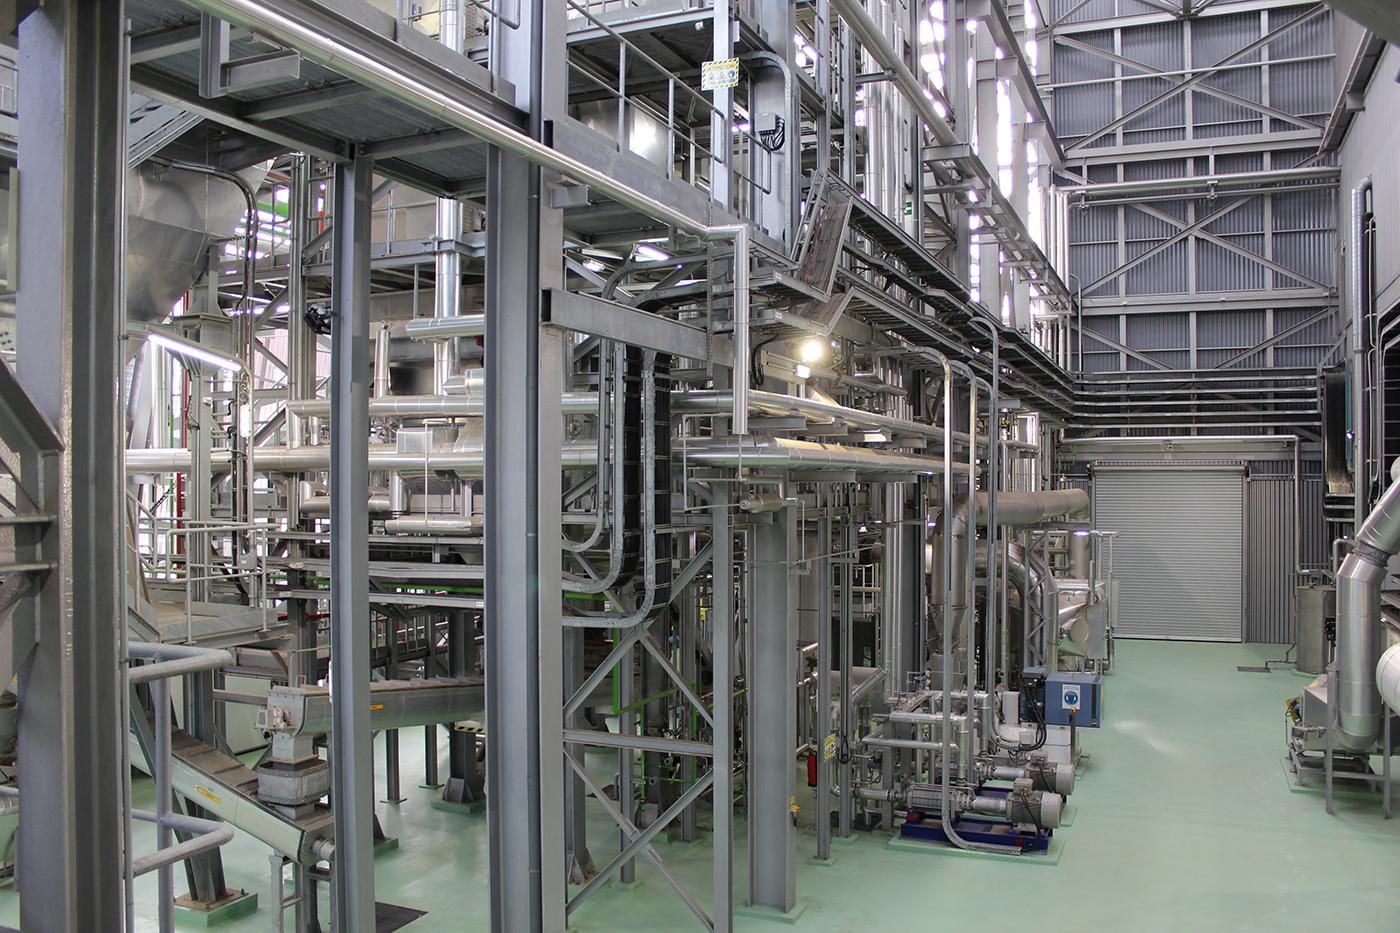 obra industrial